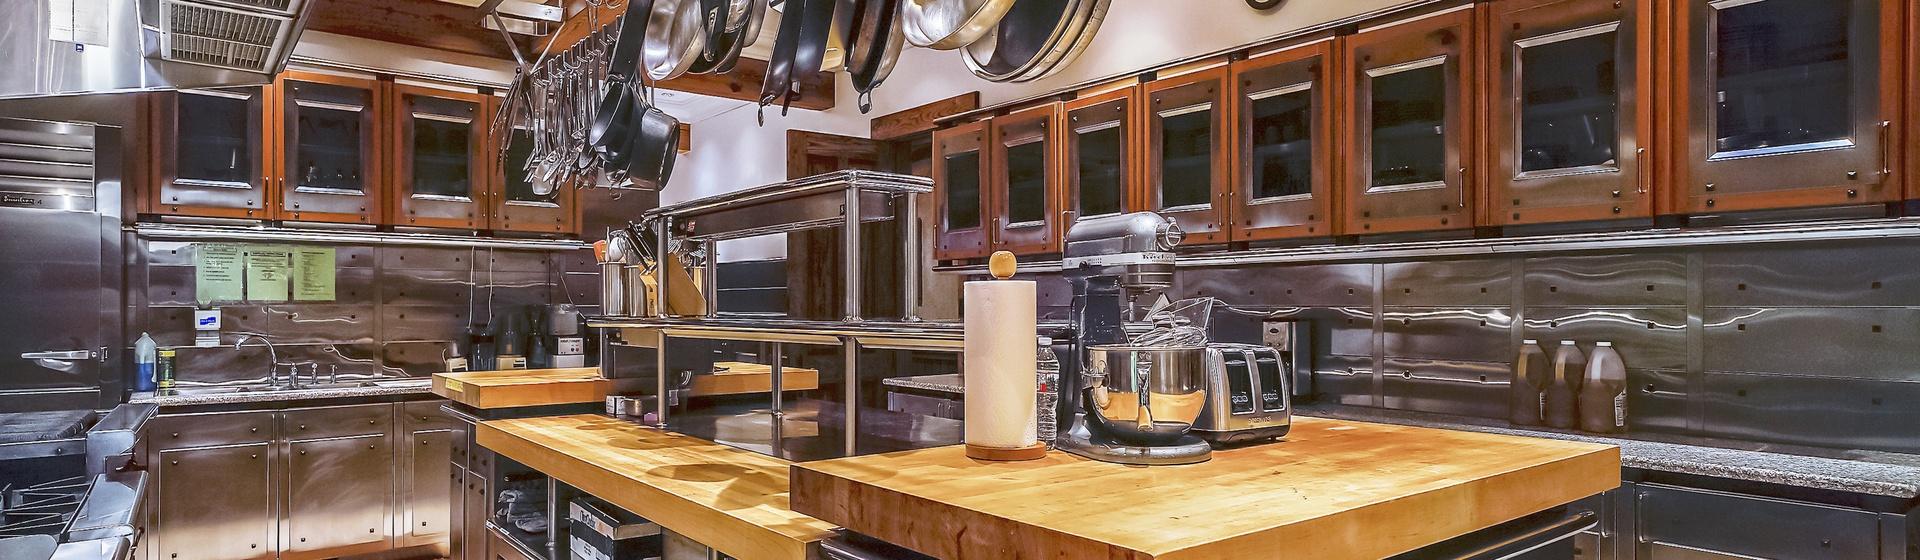 11.2-Telluride-Sleeping-Indian-Ranch-prep-service-kitchen-2-web.JPG